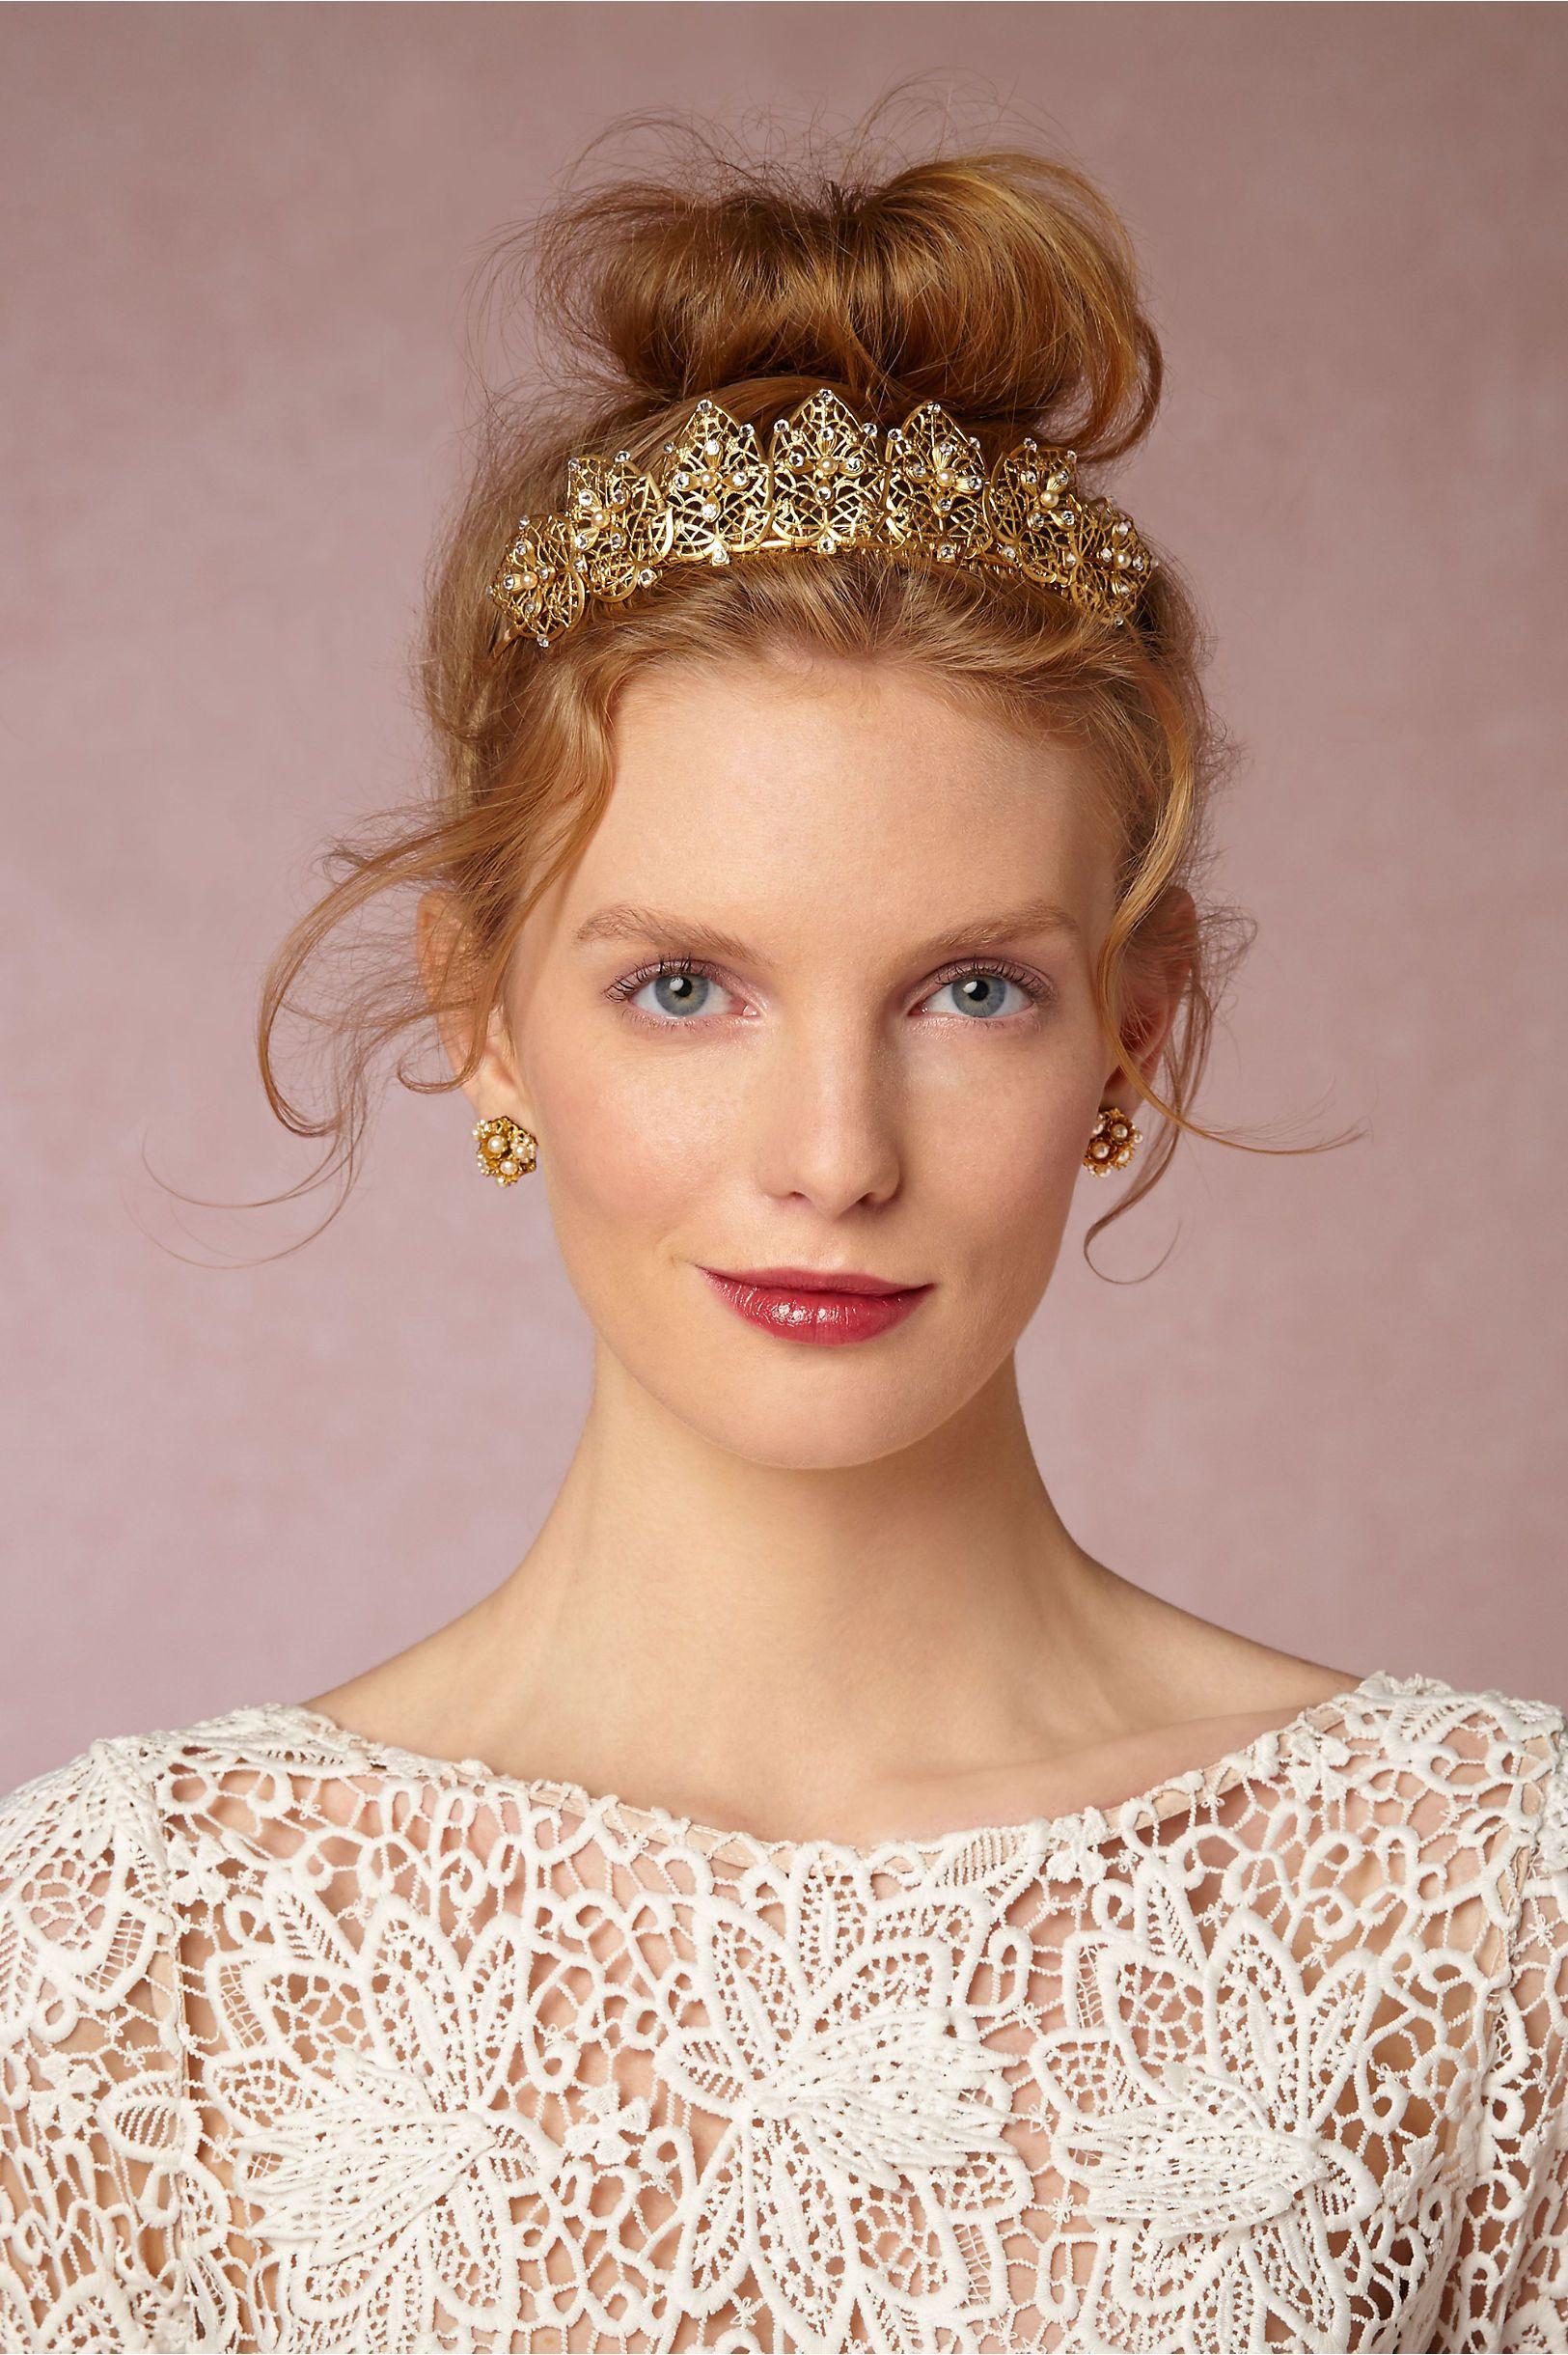 Francesca Tiara by Debra Moreland for BHLDN